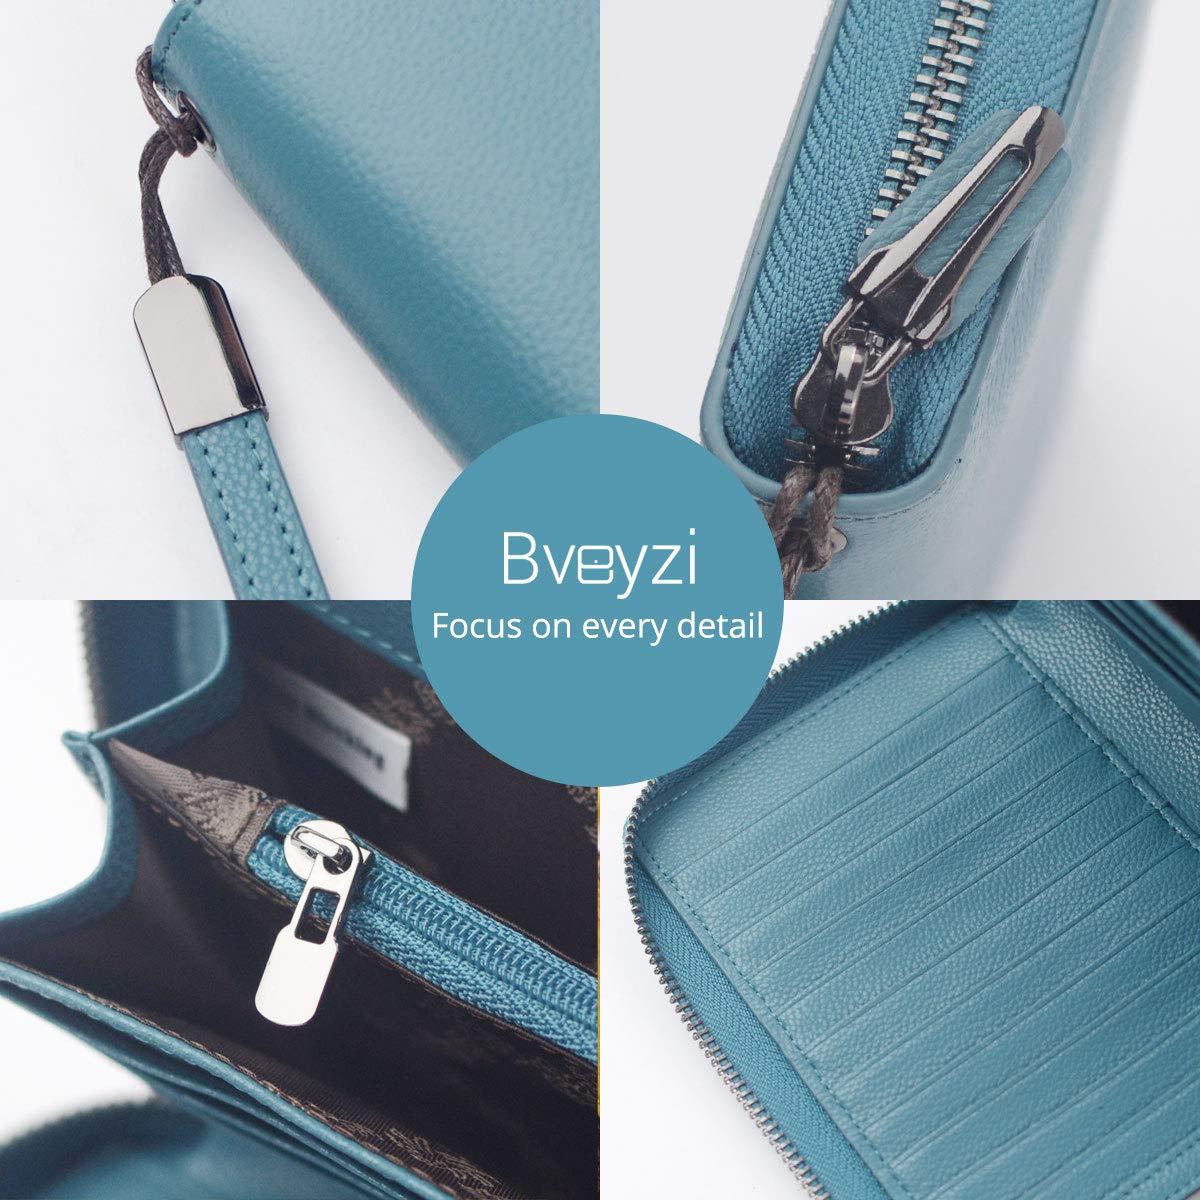 Women RFID Blocking Wallet Leather Zip Around Phone Clutch Large Travel Purse Wristlet (Lake Blue) by Bveyzi (Image #3)